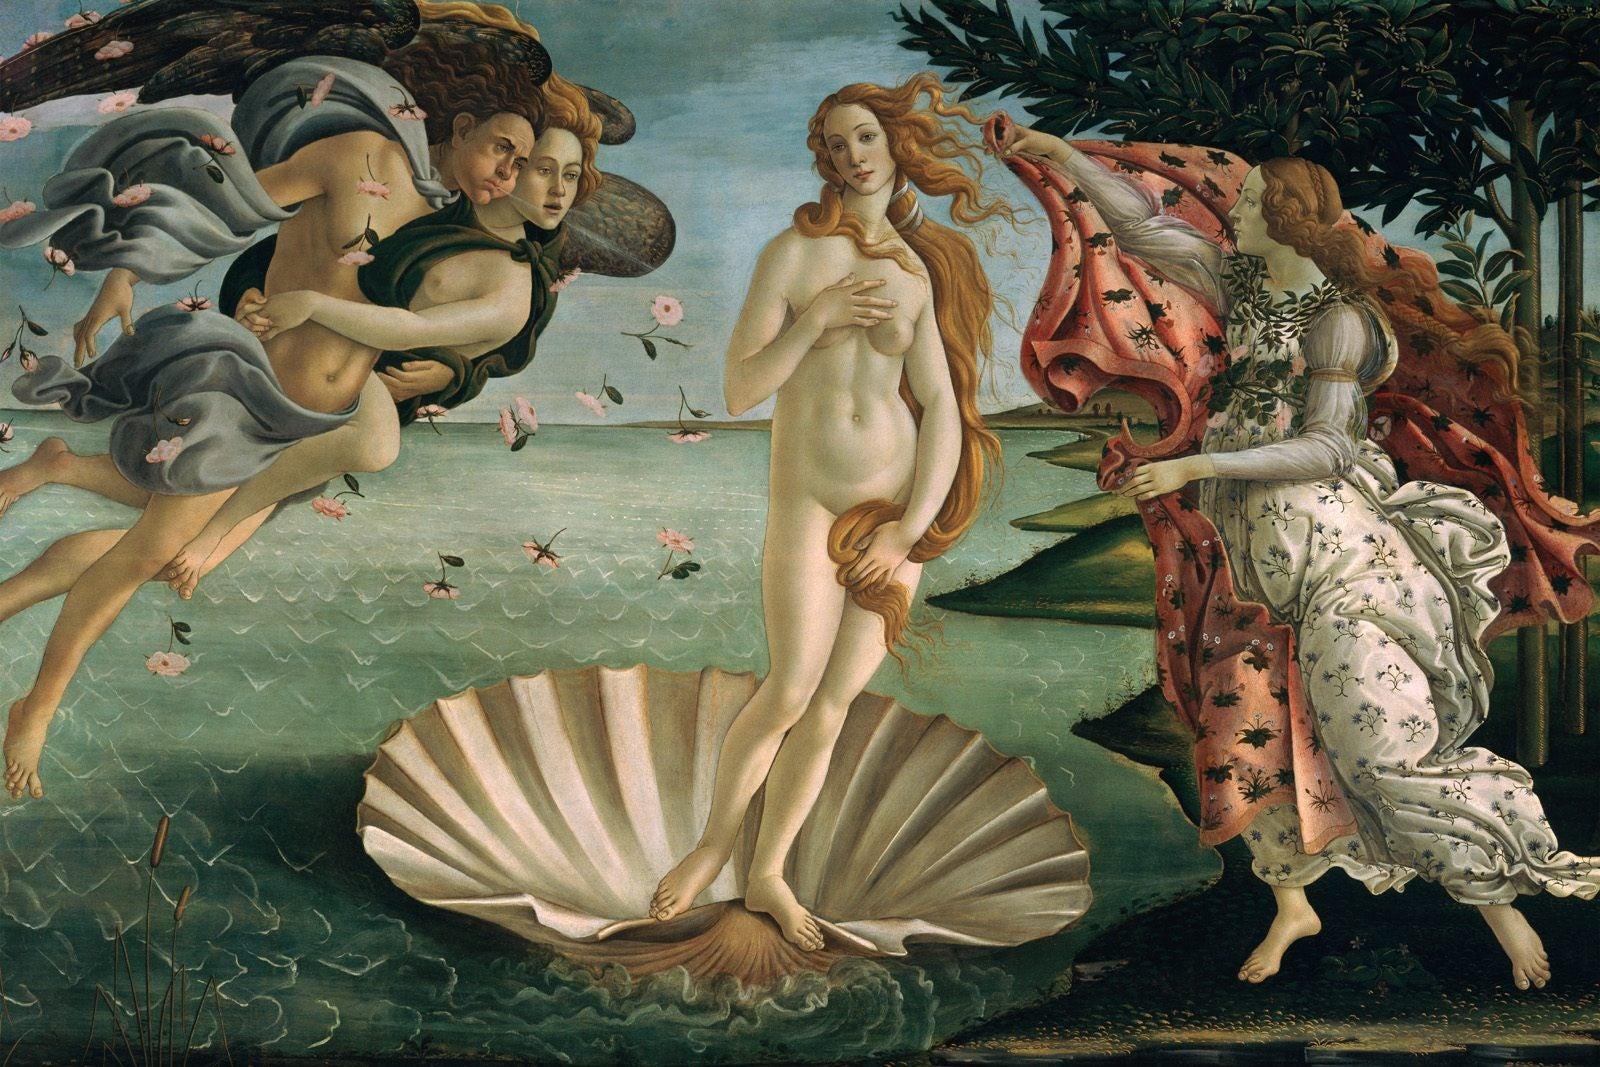 Sandro Botticelli's The Birth of Venus (1485-1486) at the Uffizi Gallery, Florence